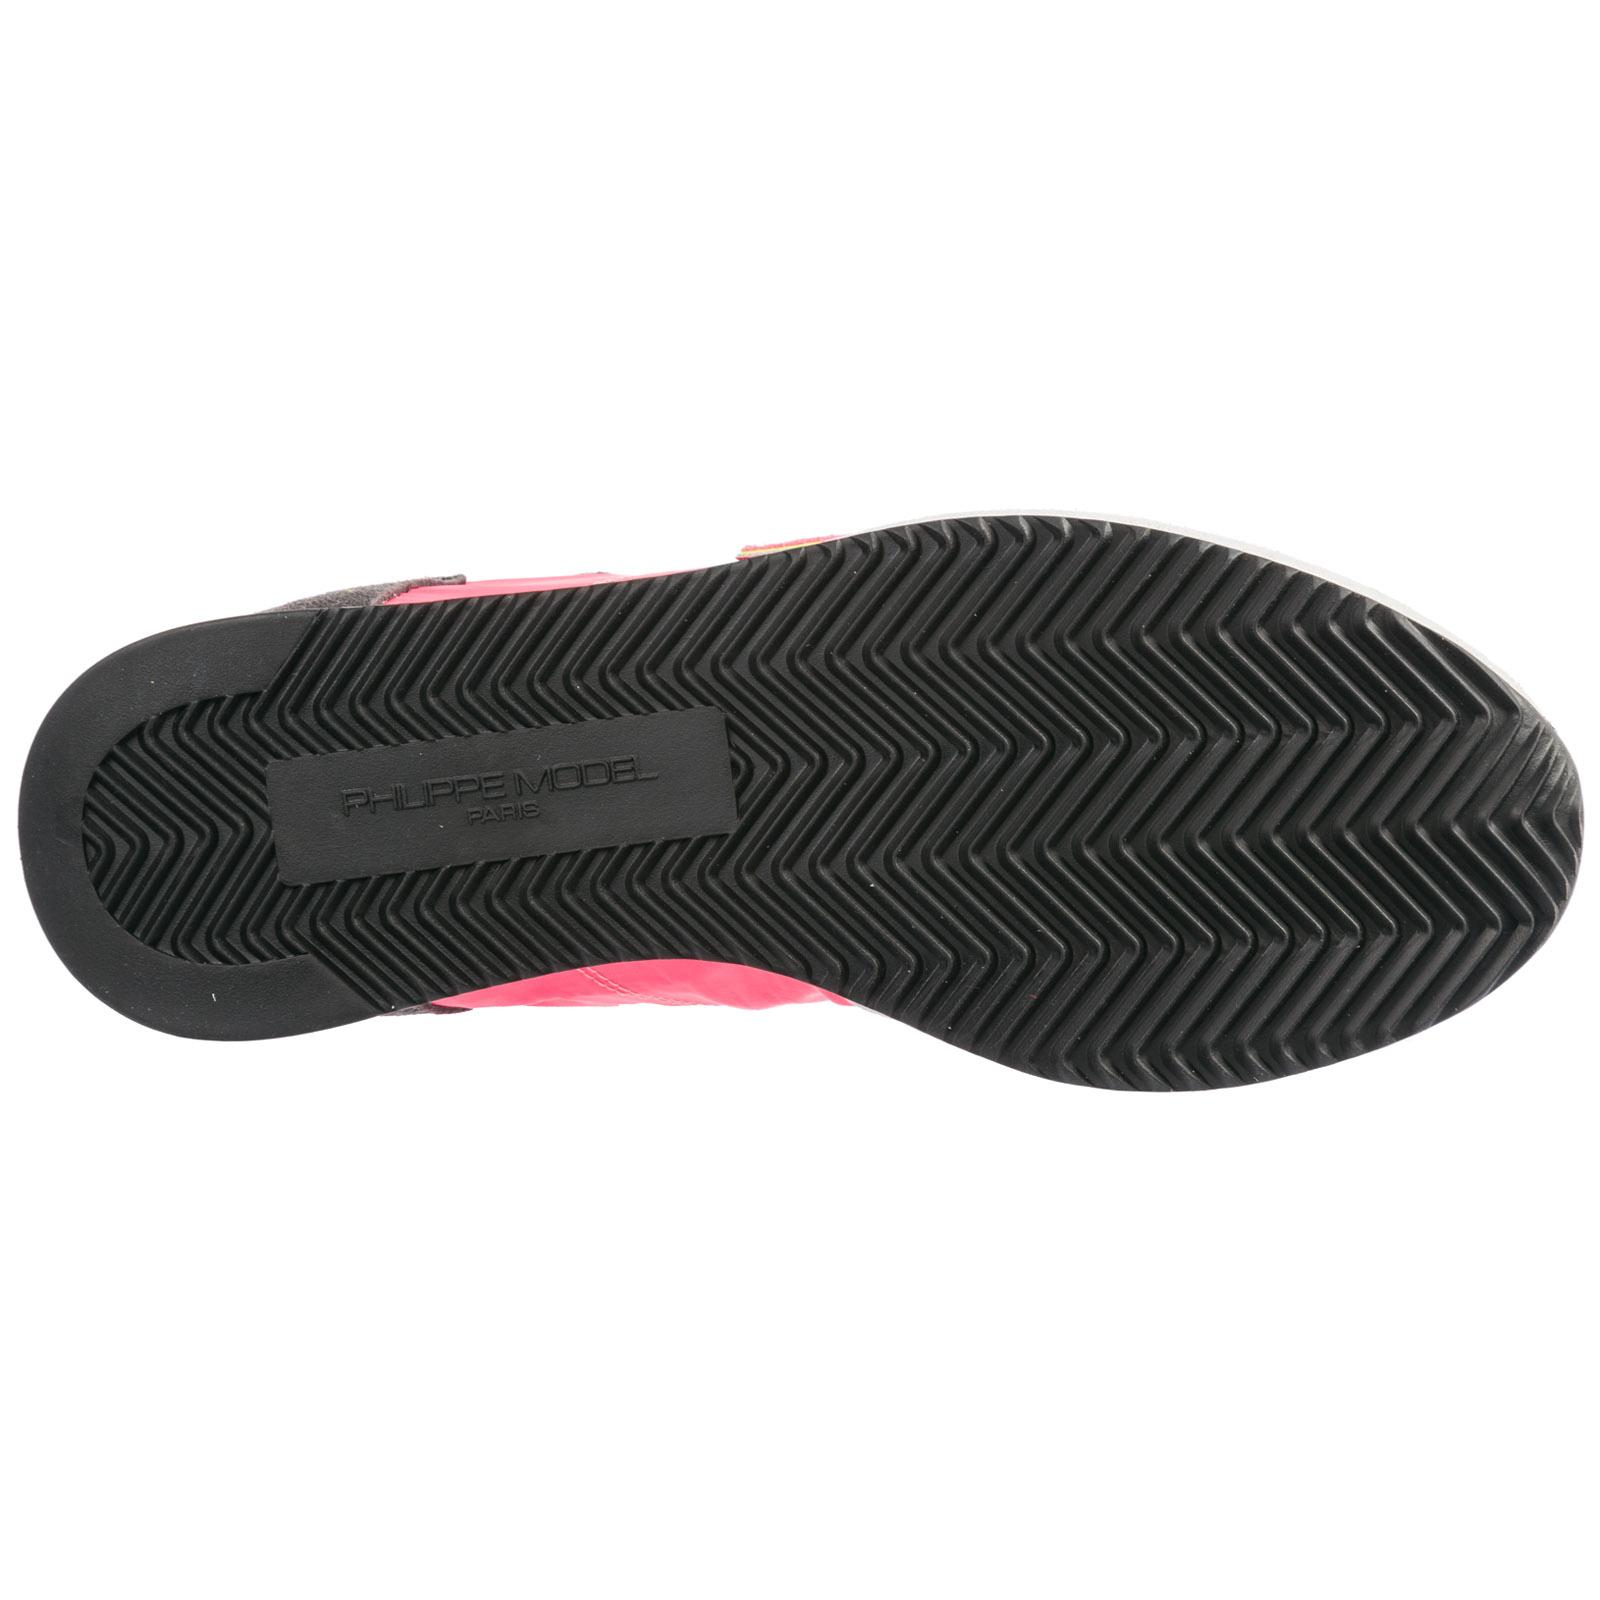 Sneakers Philippe Model Tropez A19ETRLDN001 jaune fucsia  152f627ebb2